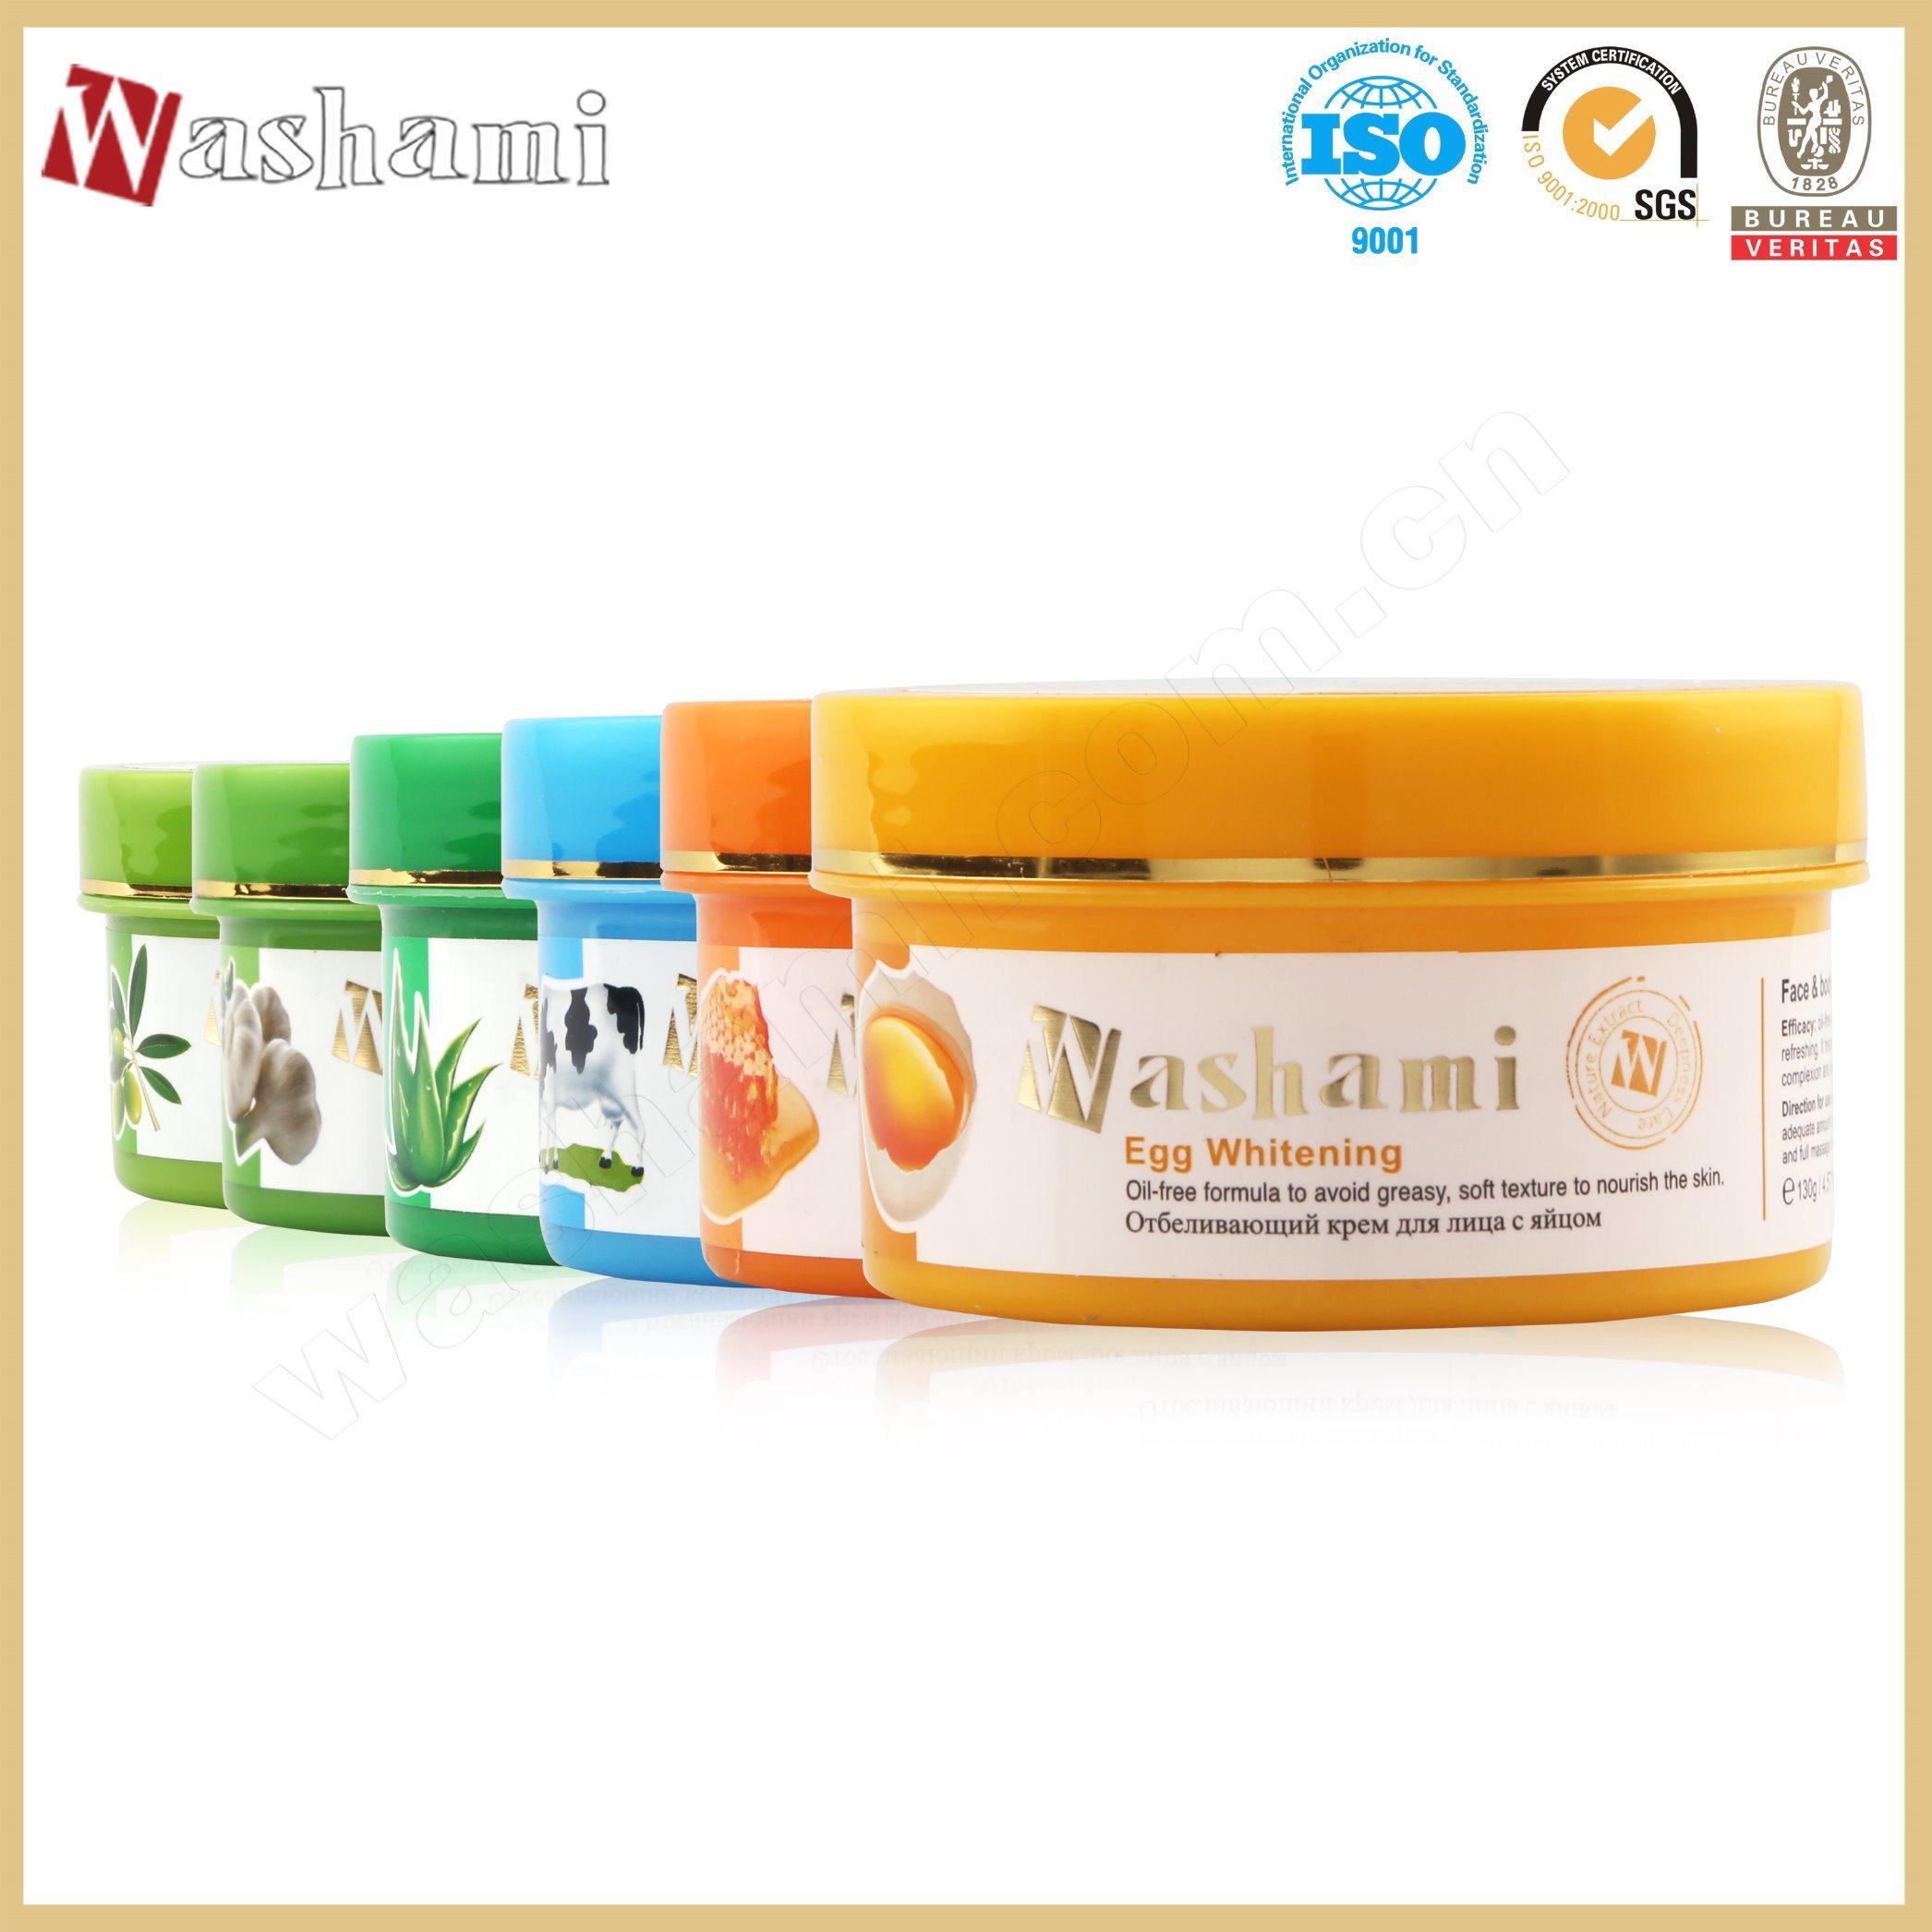 Washami Skin Lightening Face Whitening Cream